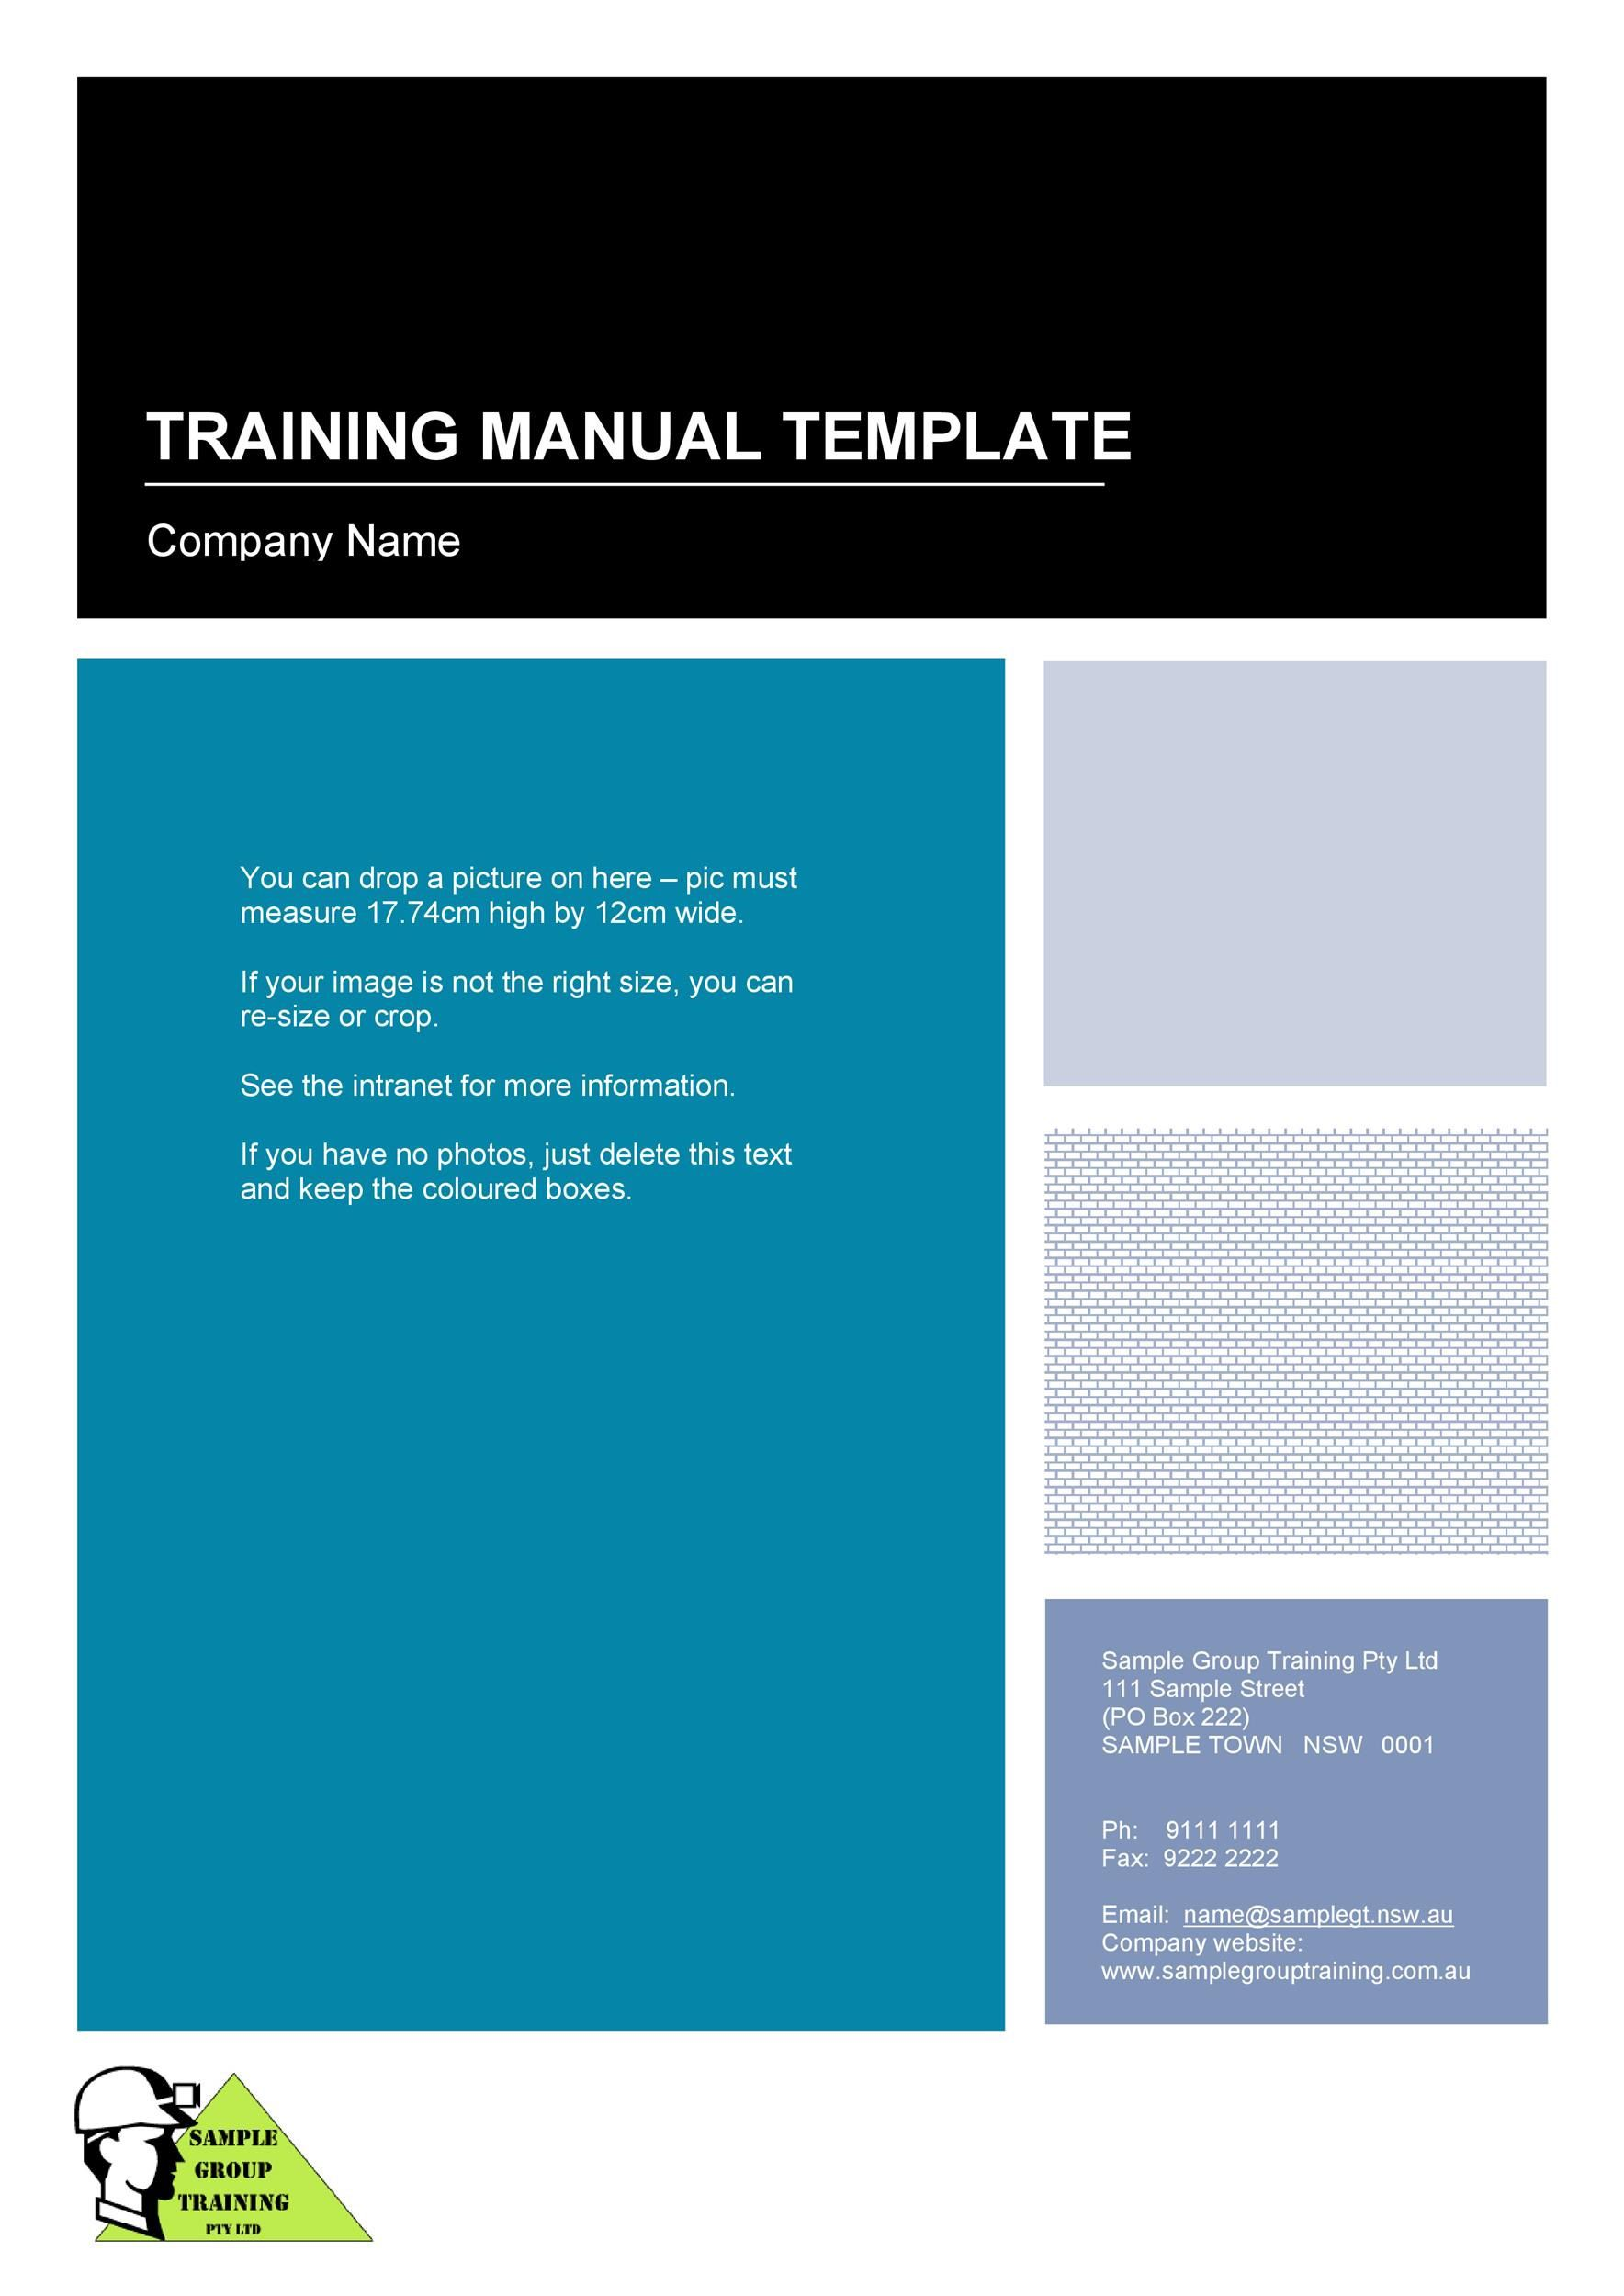 000 Phenomenal Employee Training Manual Template Inspiration  New Hire ExampleFull